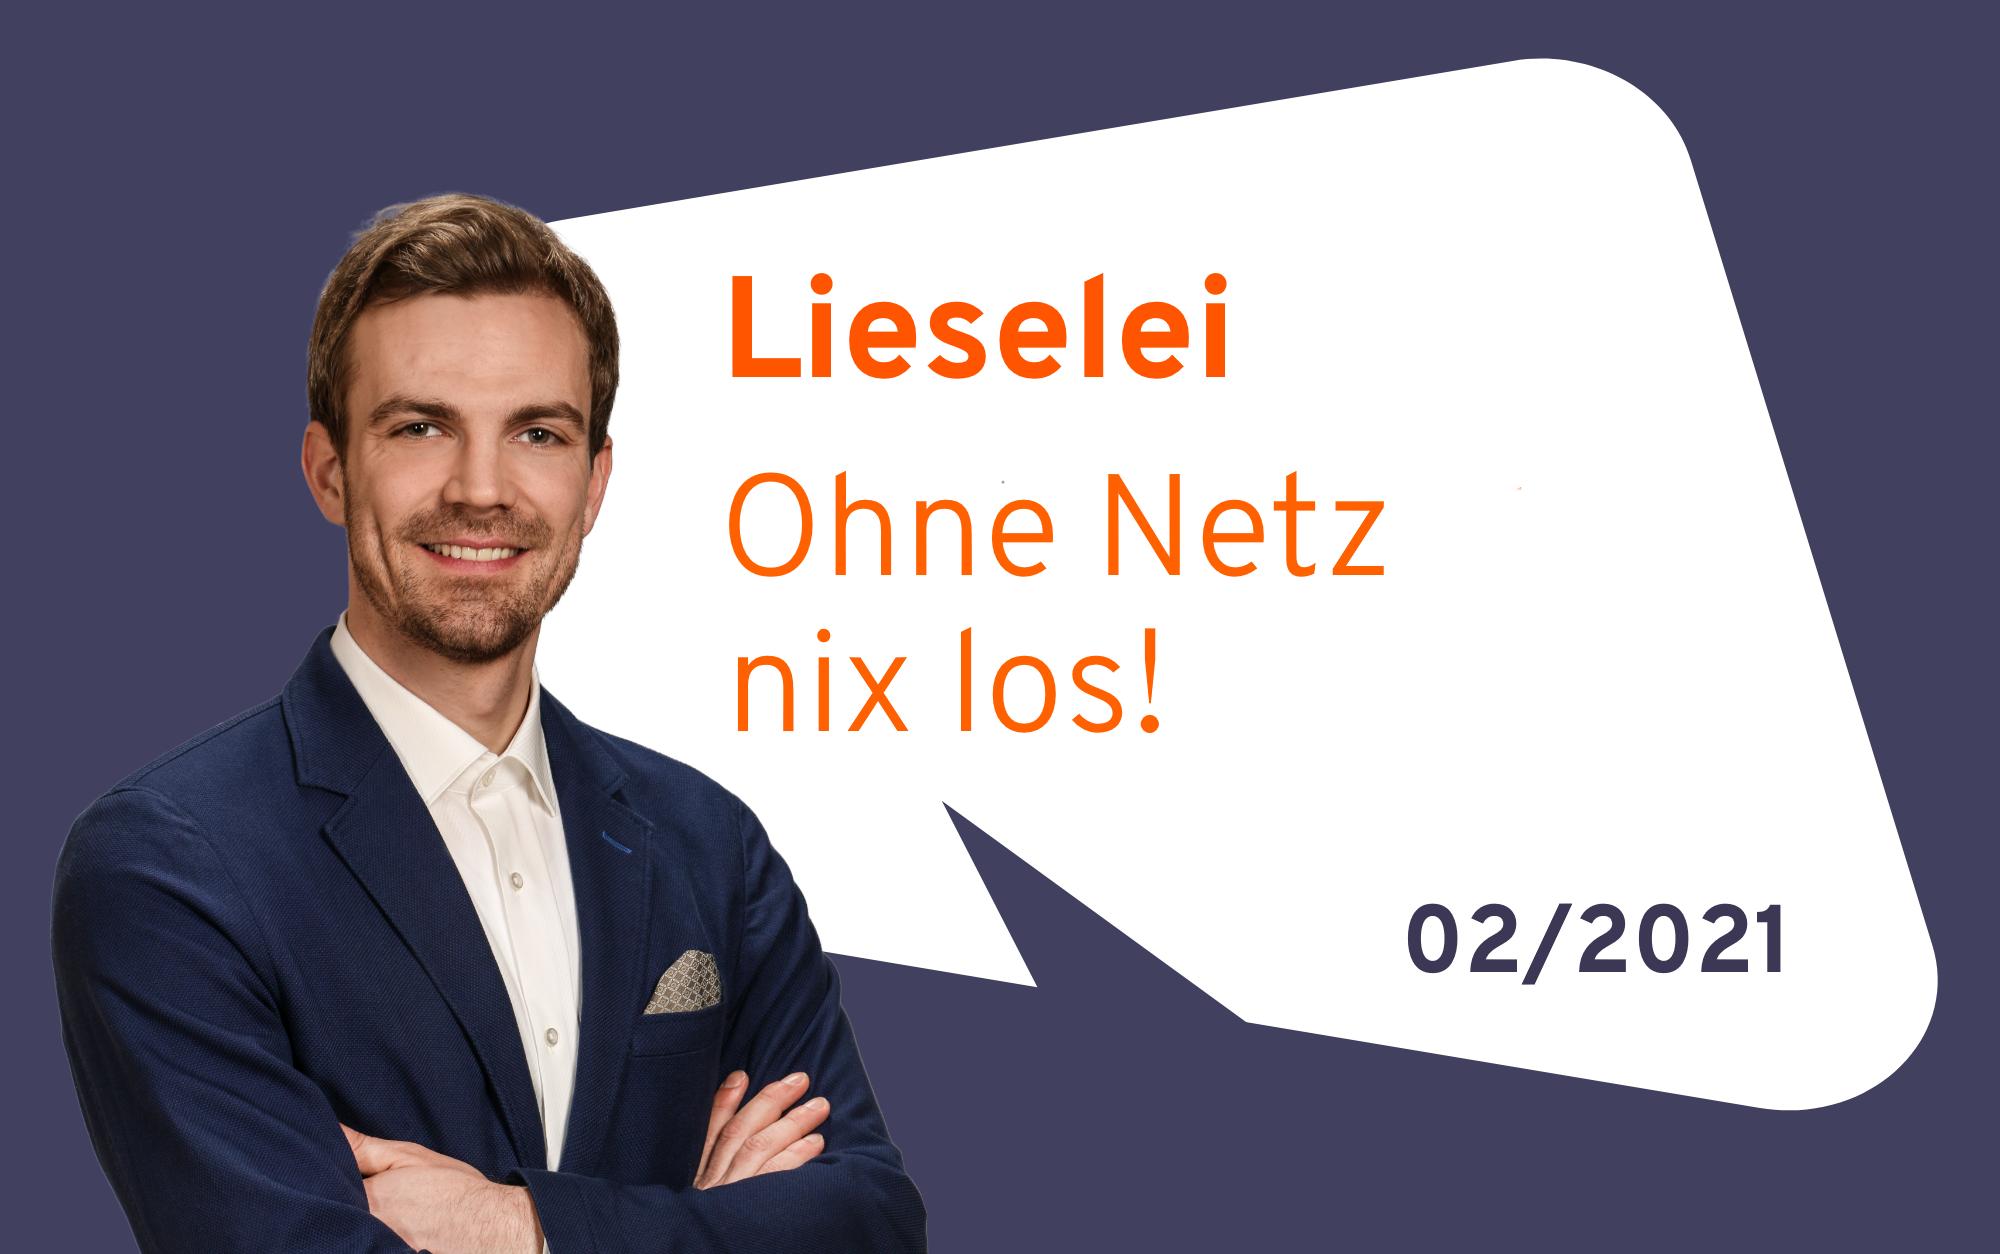 Lieselei – Ohne Netz Nix Los!